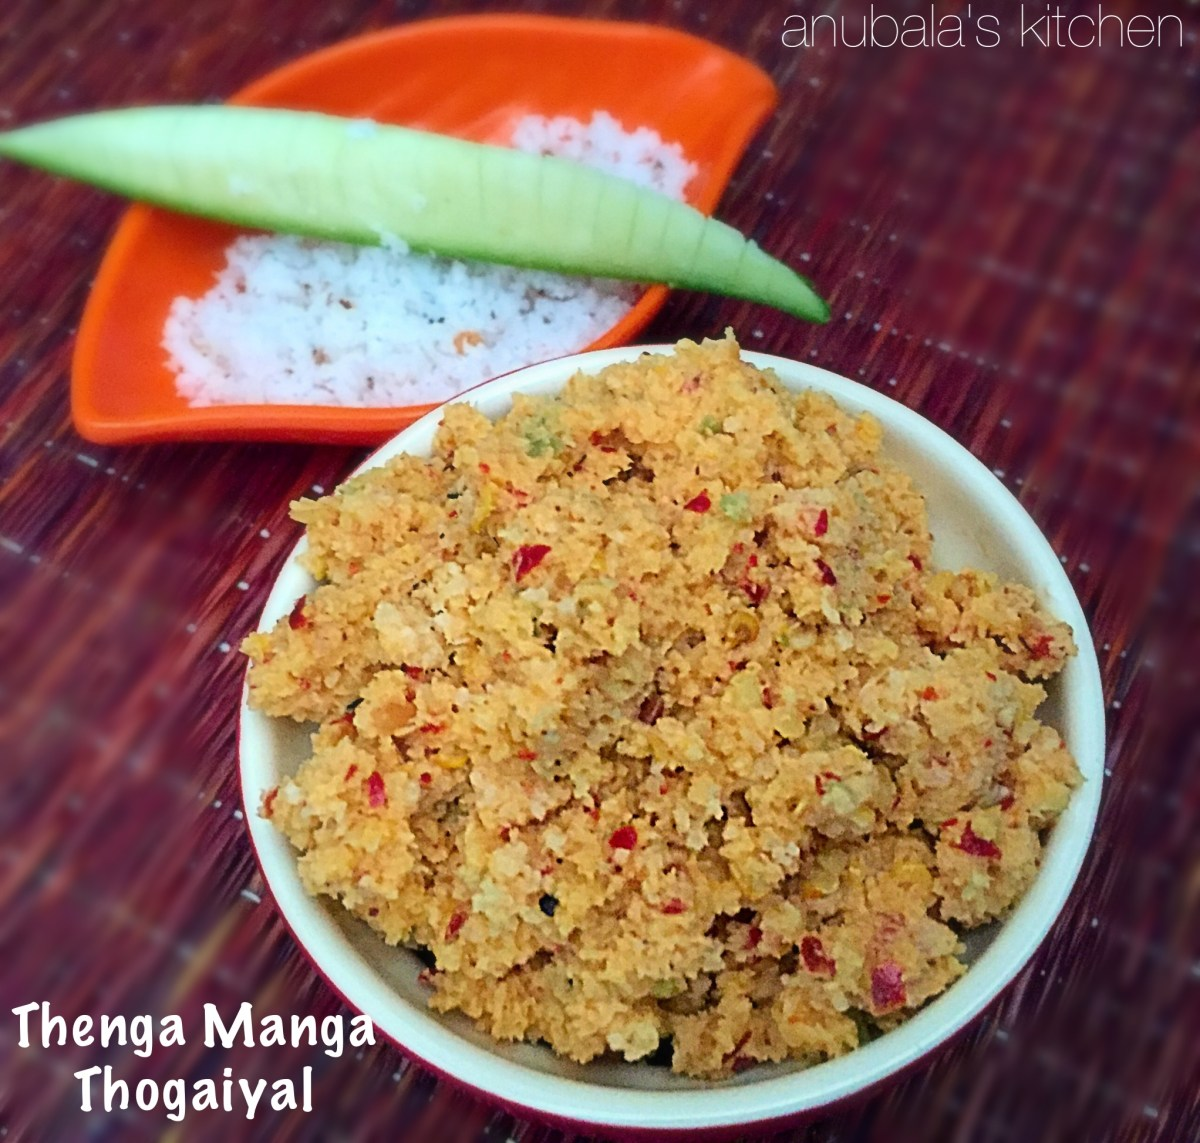 Thenga Manga Thogaiyal